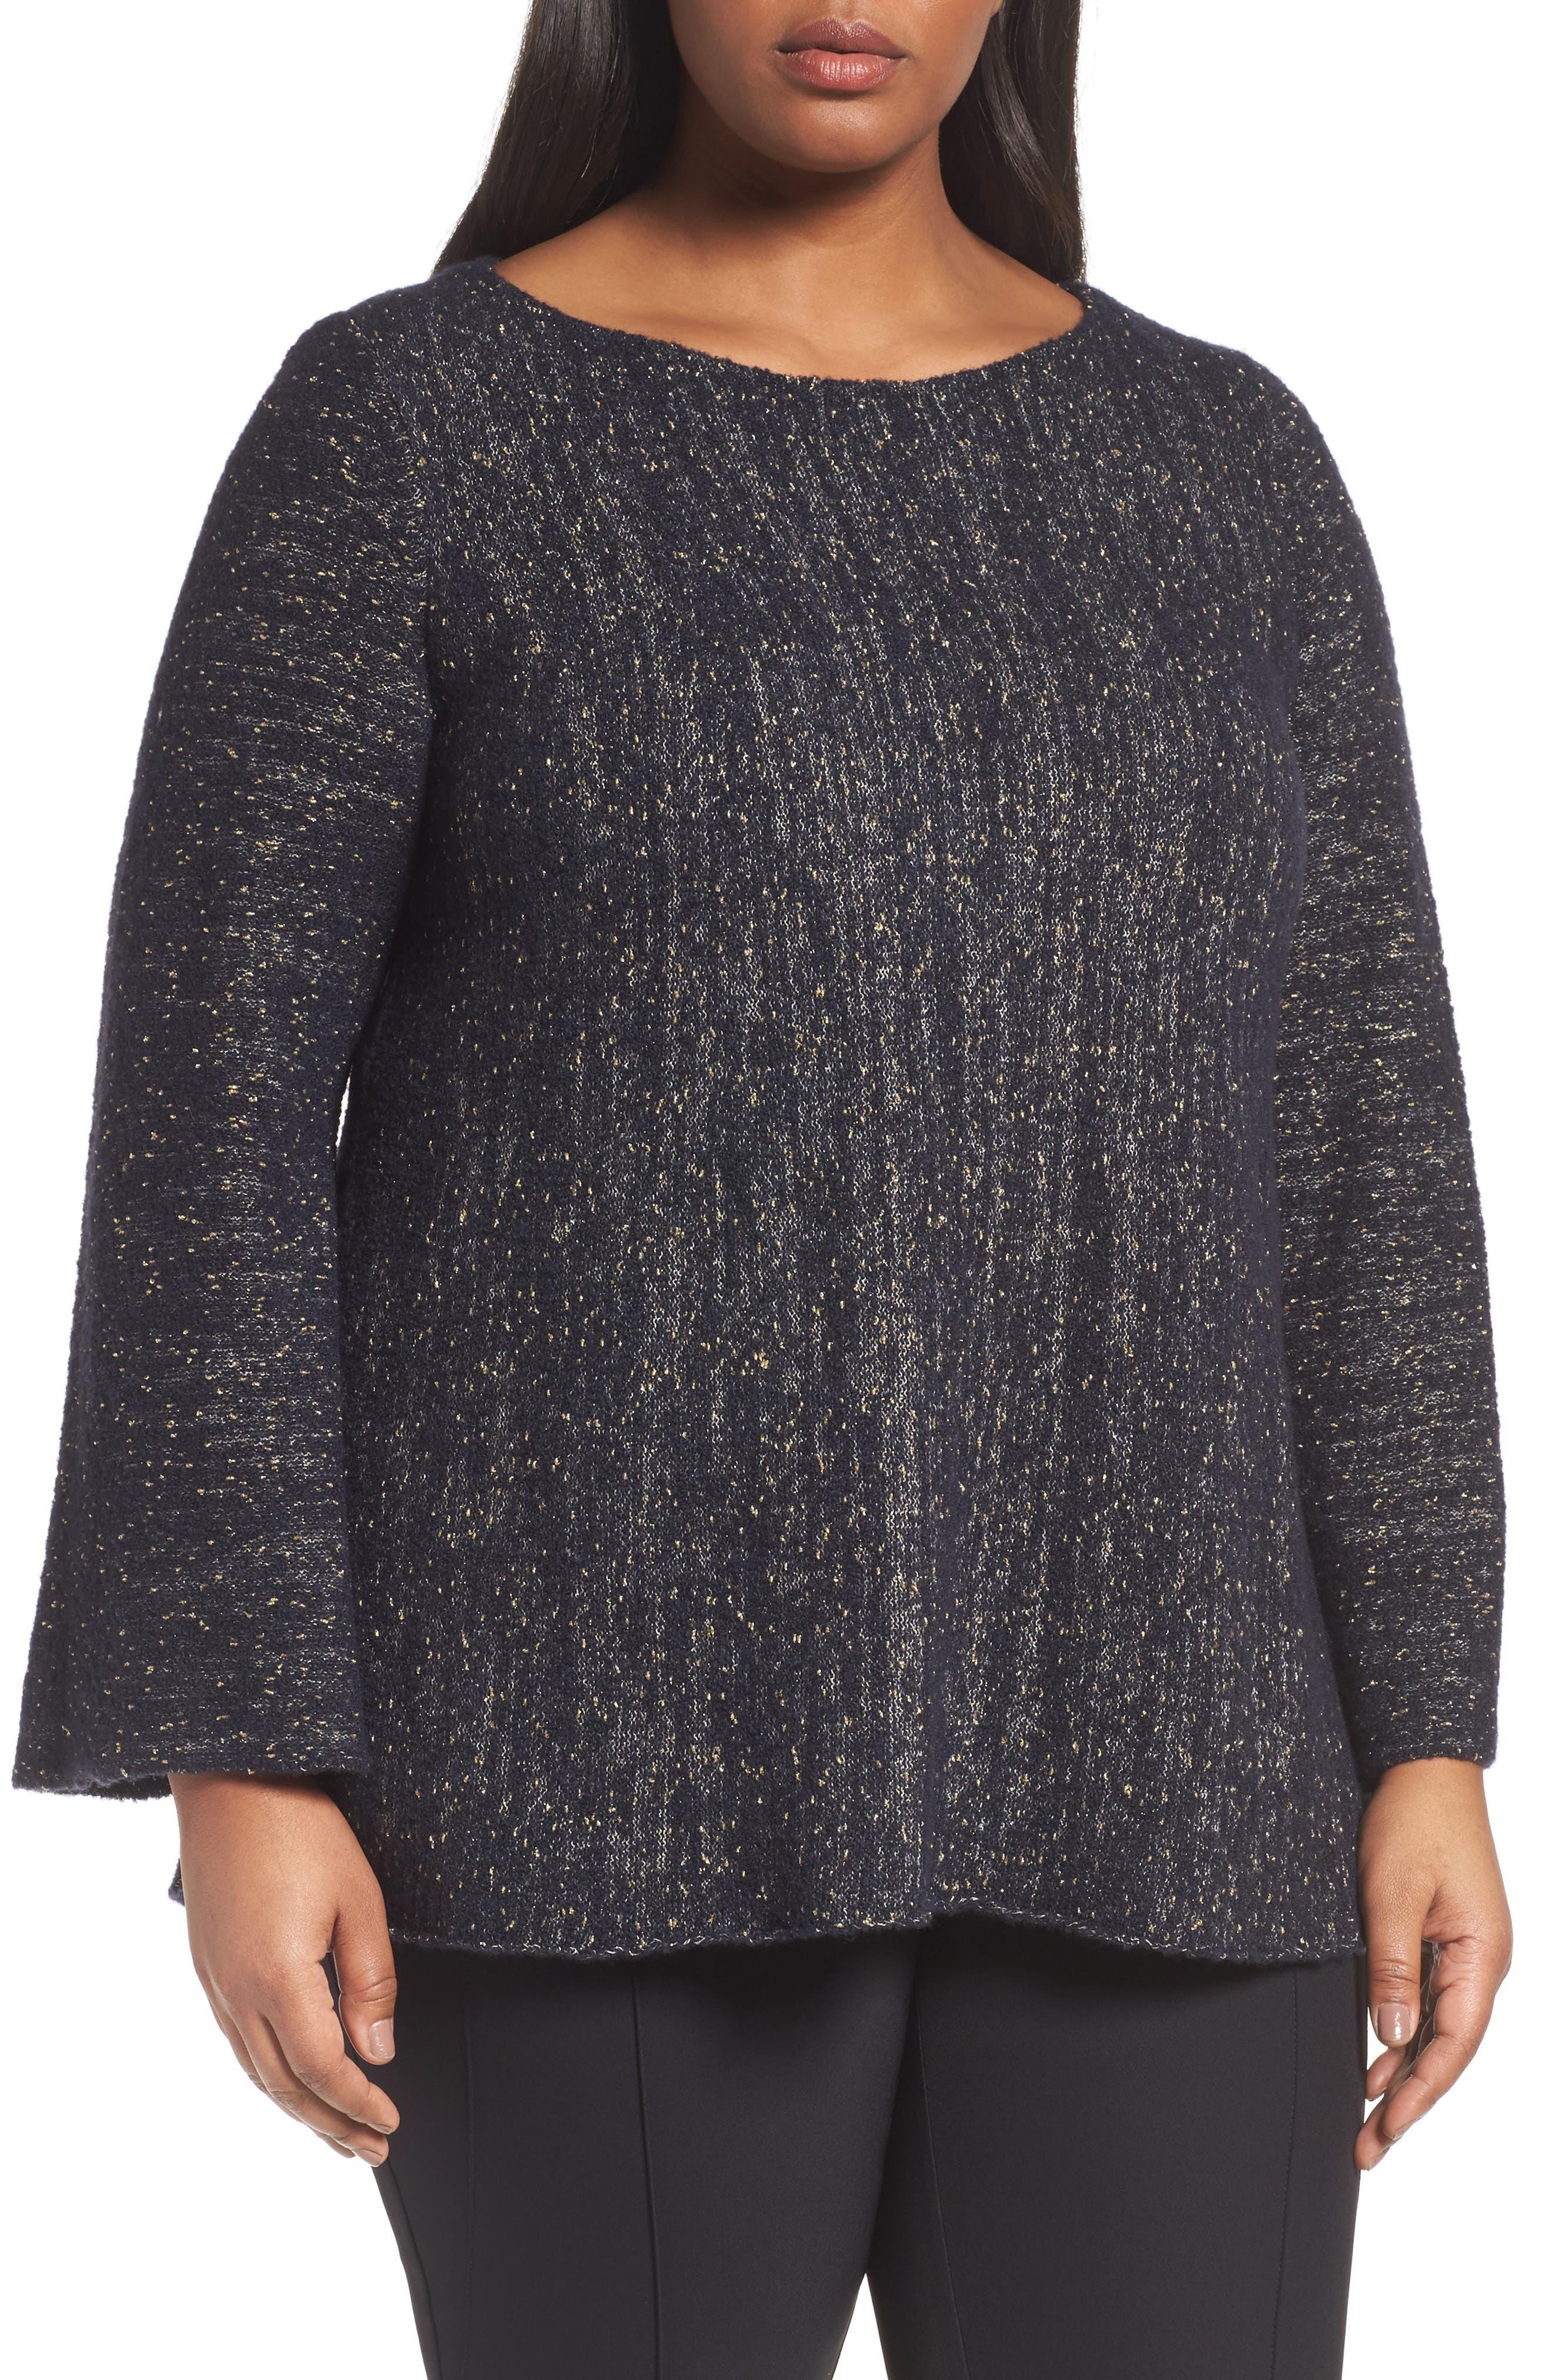 Lafayette 148 Metallic Knit A-Line Sweater,                         Main,                         color, 479